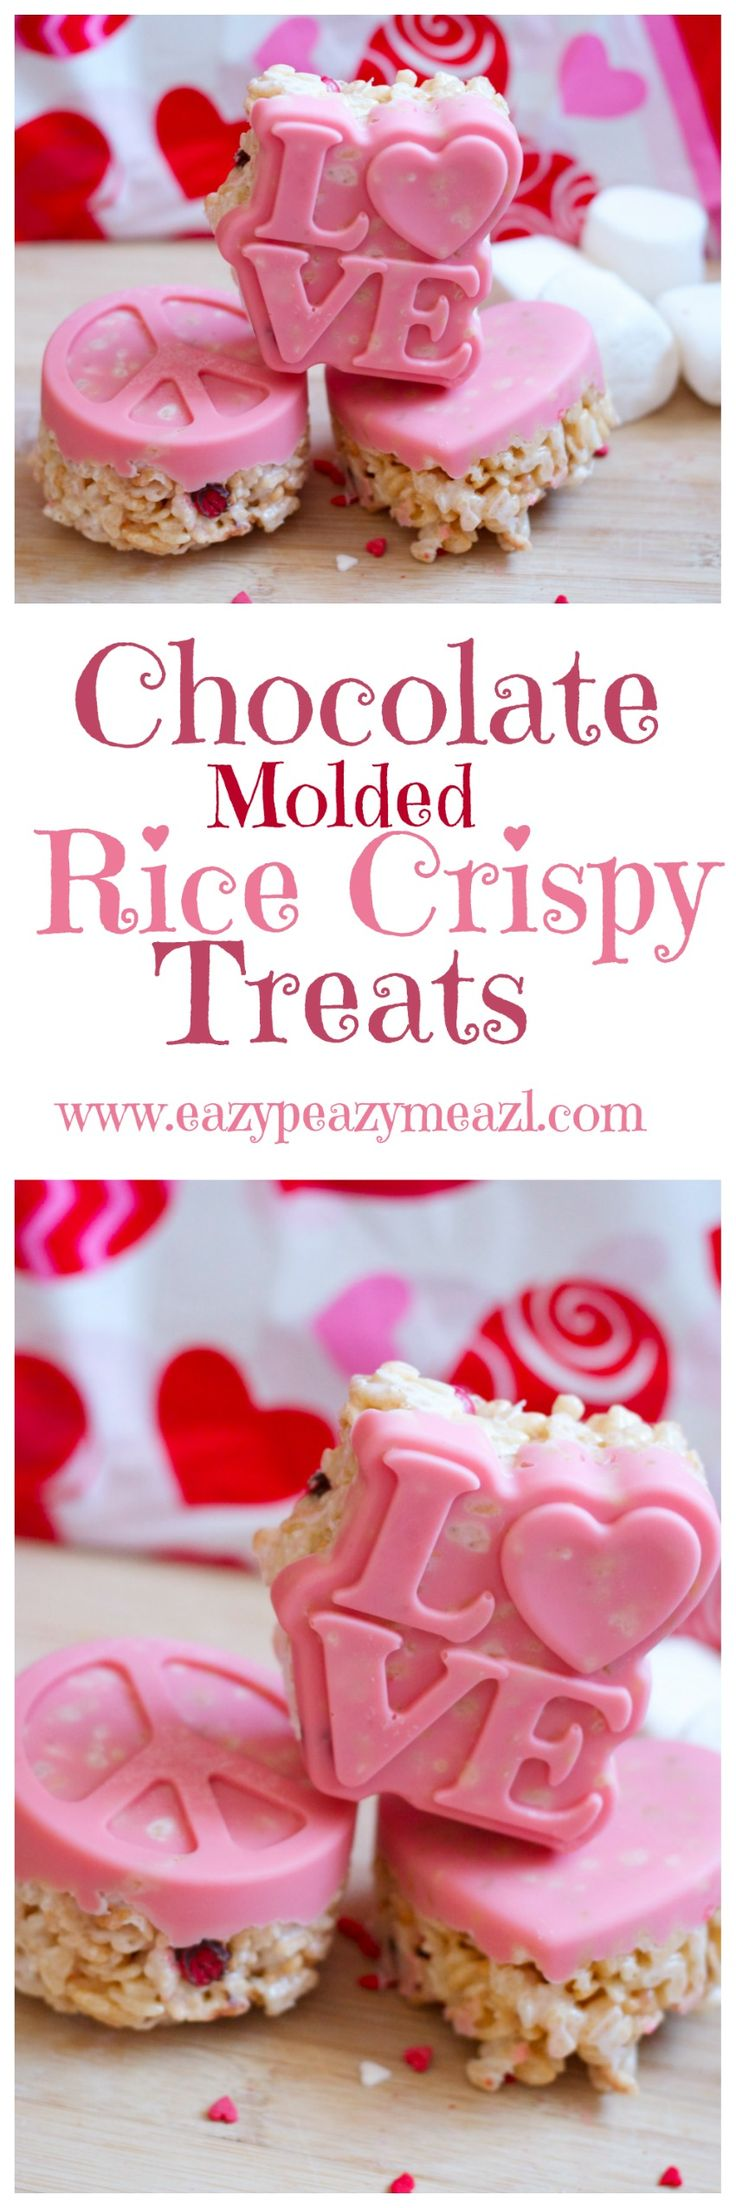 Chocolate molded rice crispy treats: An easy, fun, and beautiful treat! - Eazy Peazy Mealz